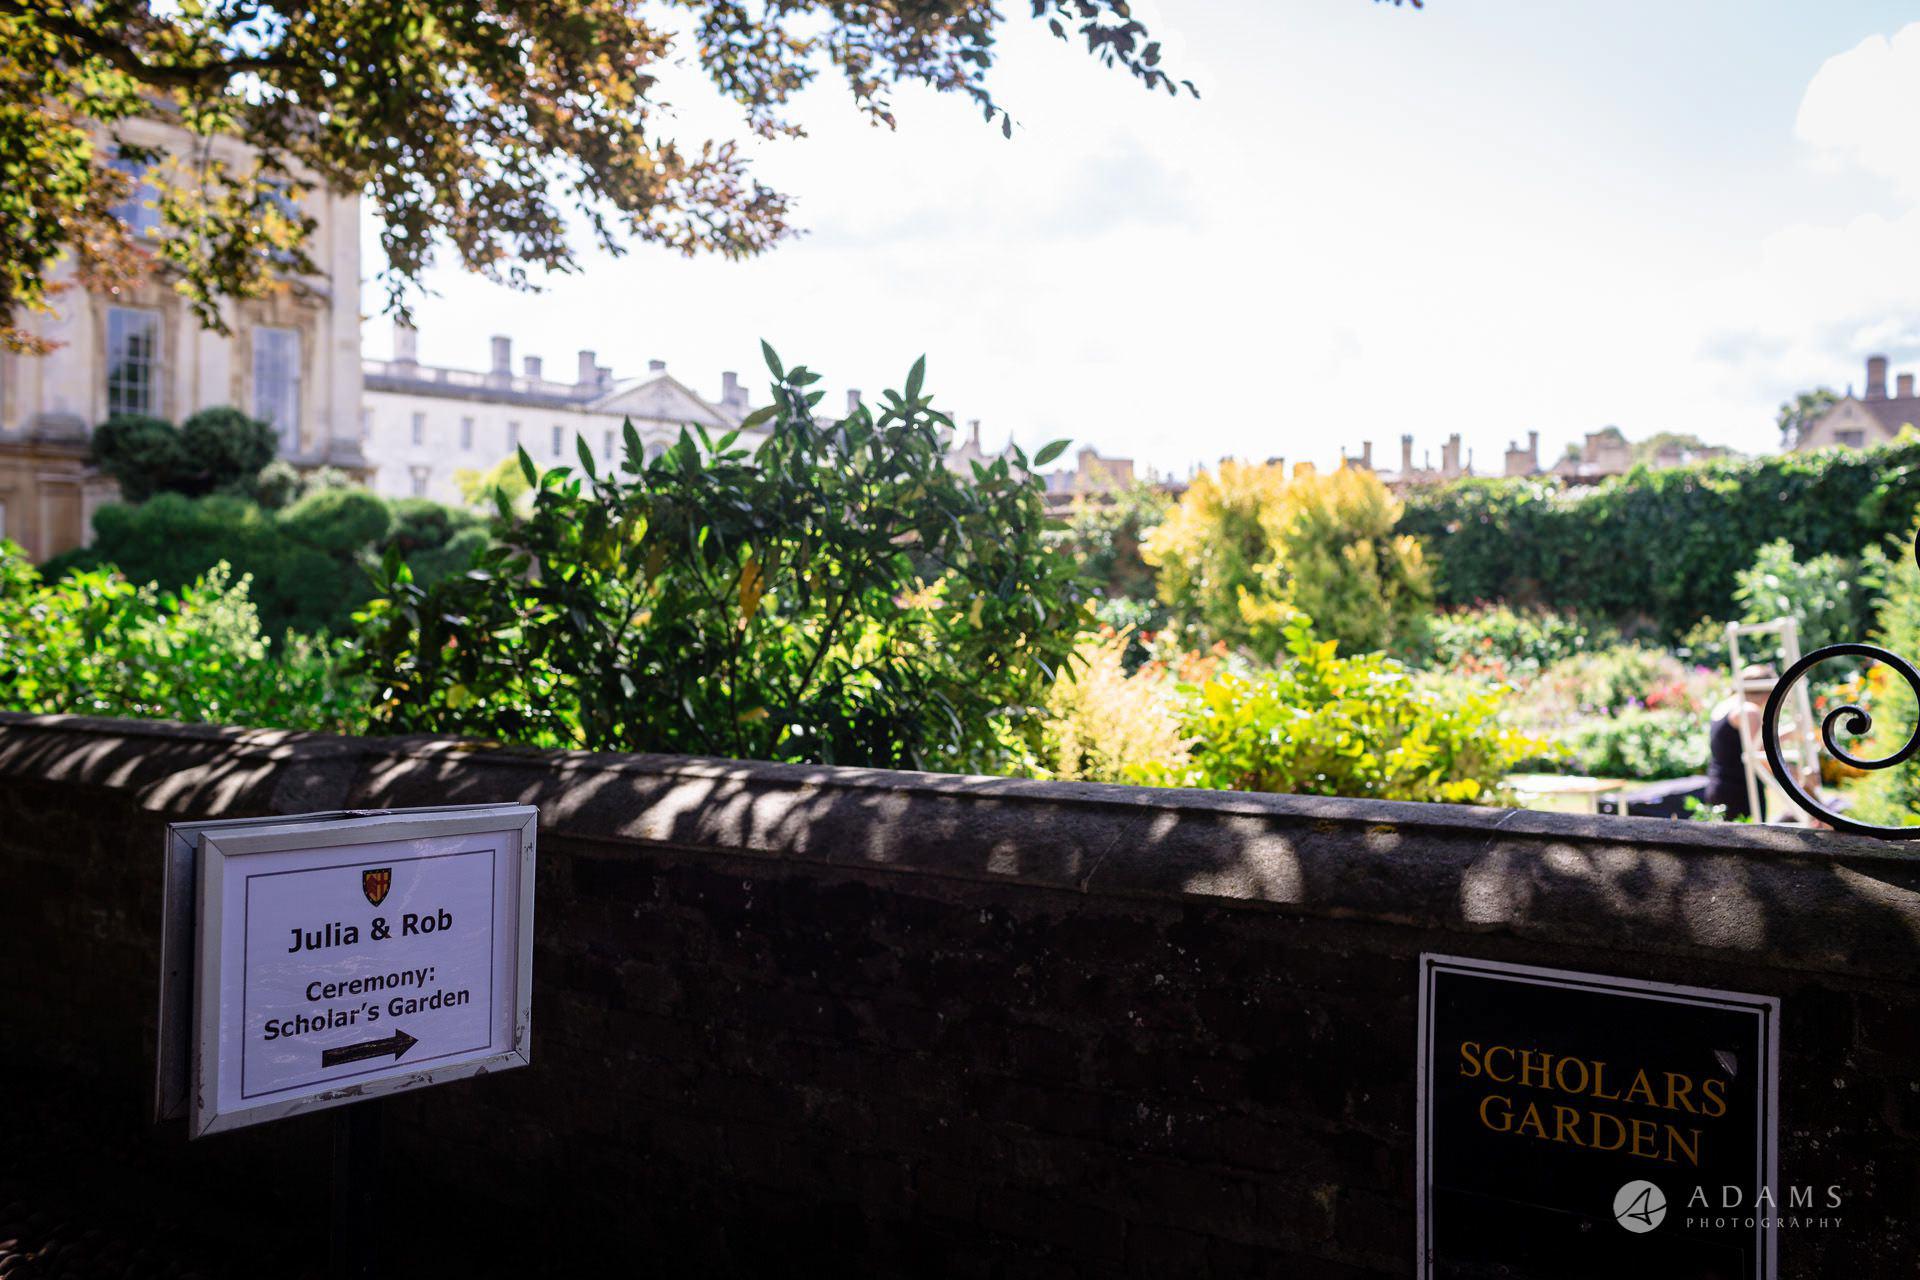 Clare College wedding sign